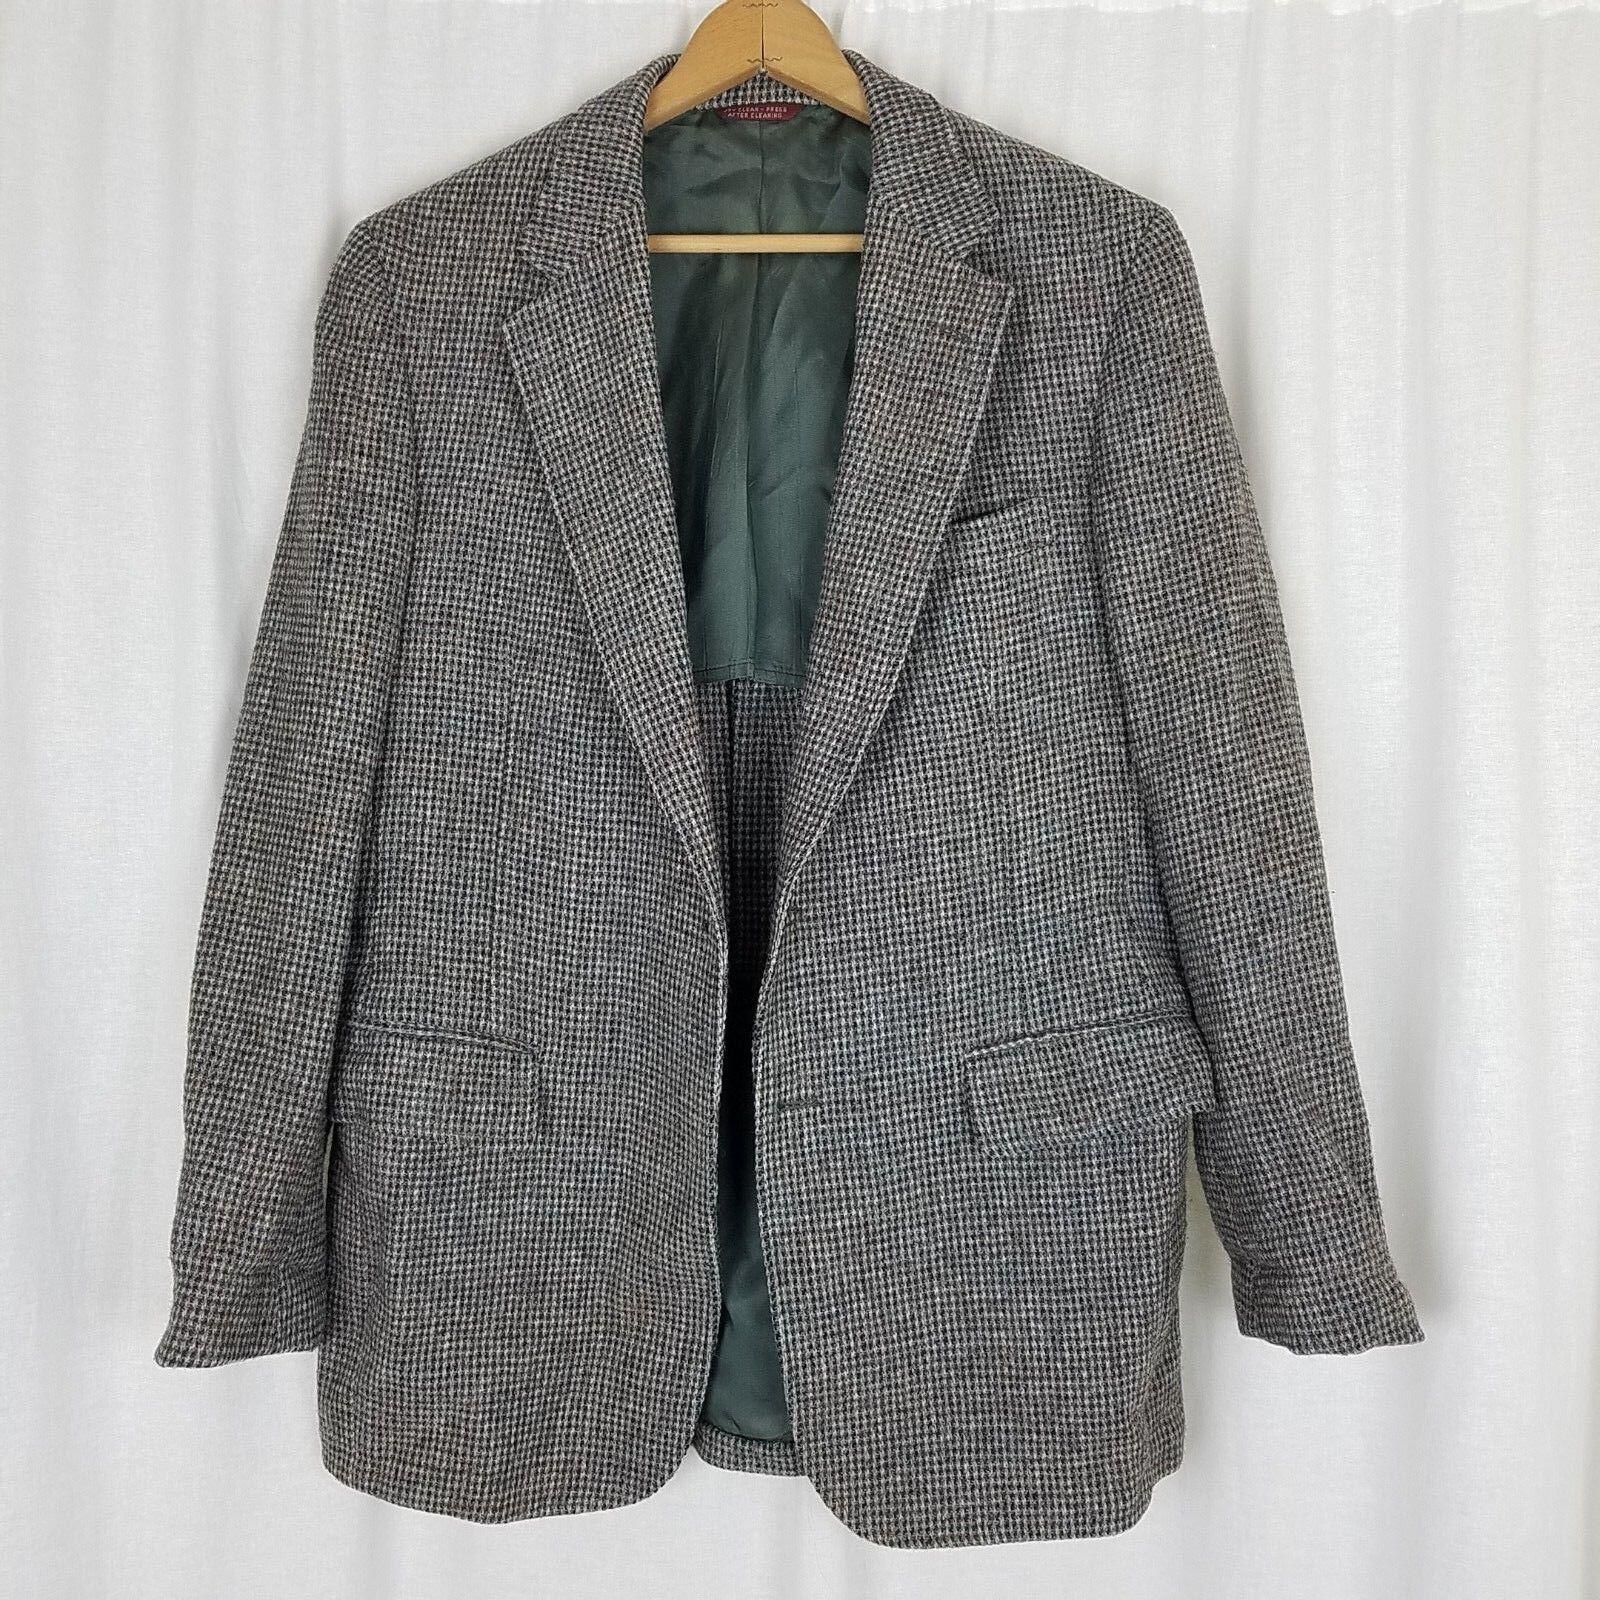 Vintage 50s Jahre Harris Tweed Hundezahn Sport Jacke Blazer Mantel Mcm Grau